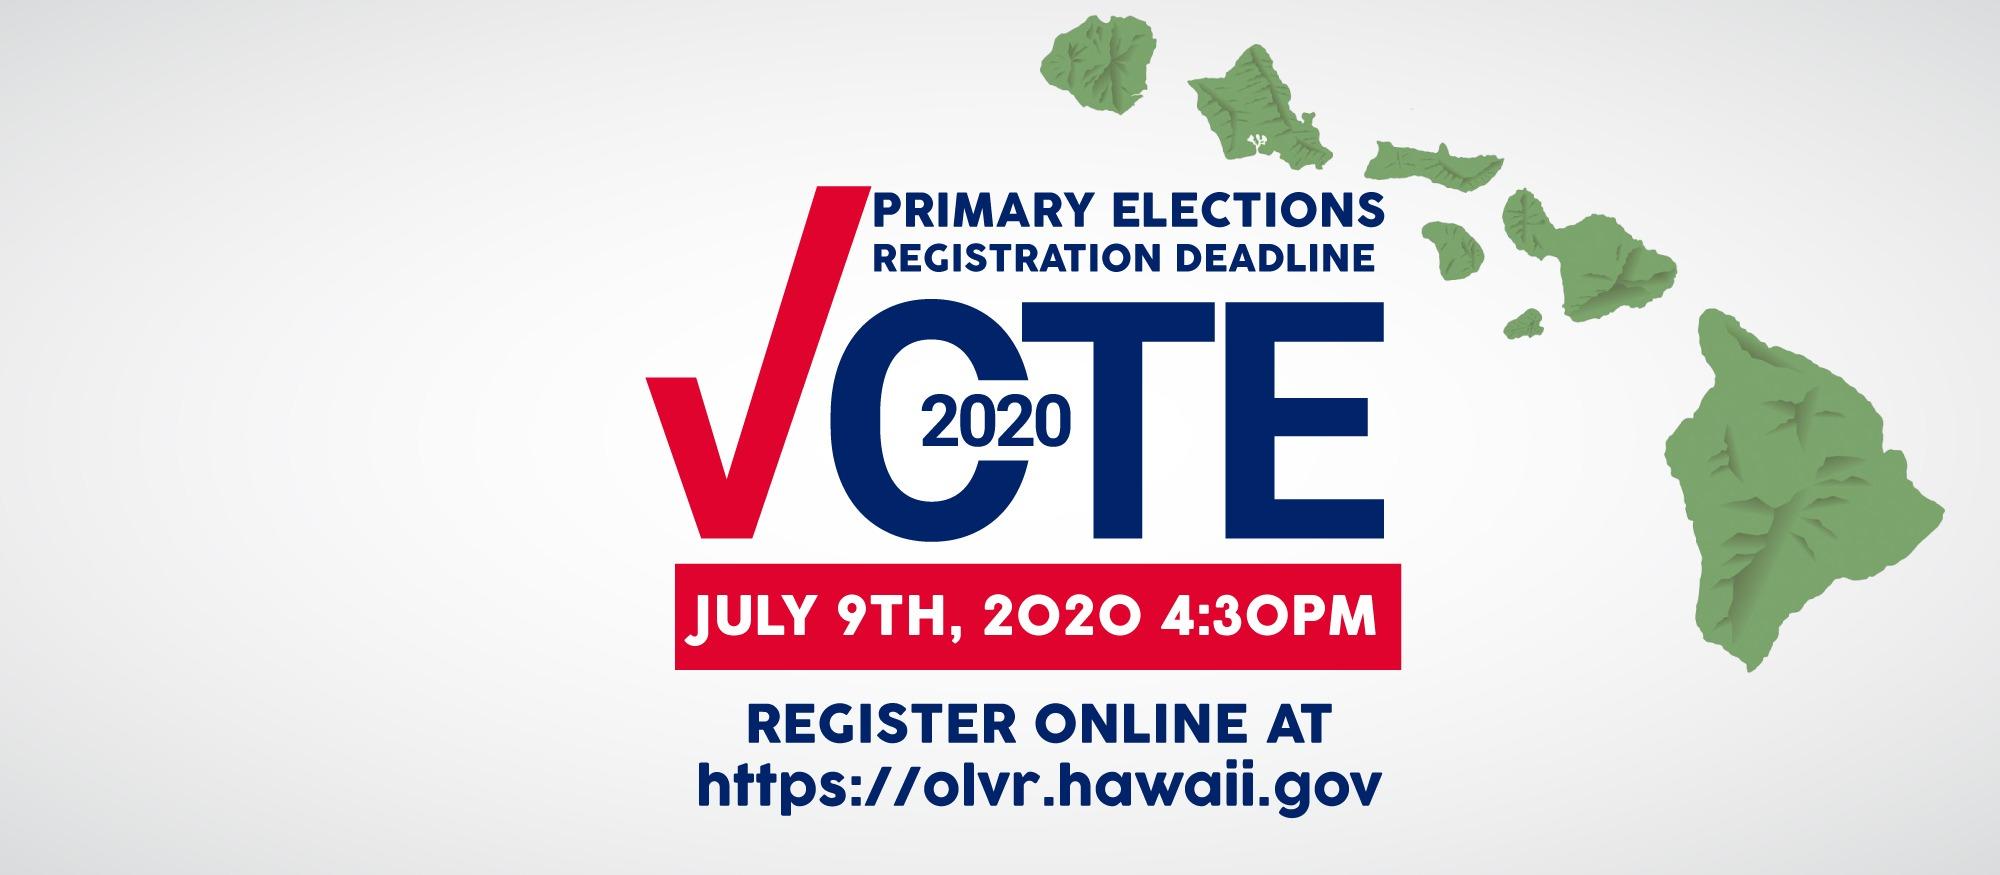 PRIMARY ELECTION Voter registration deadline July 9th, 2020